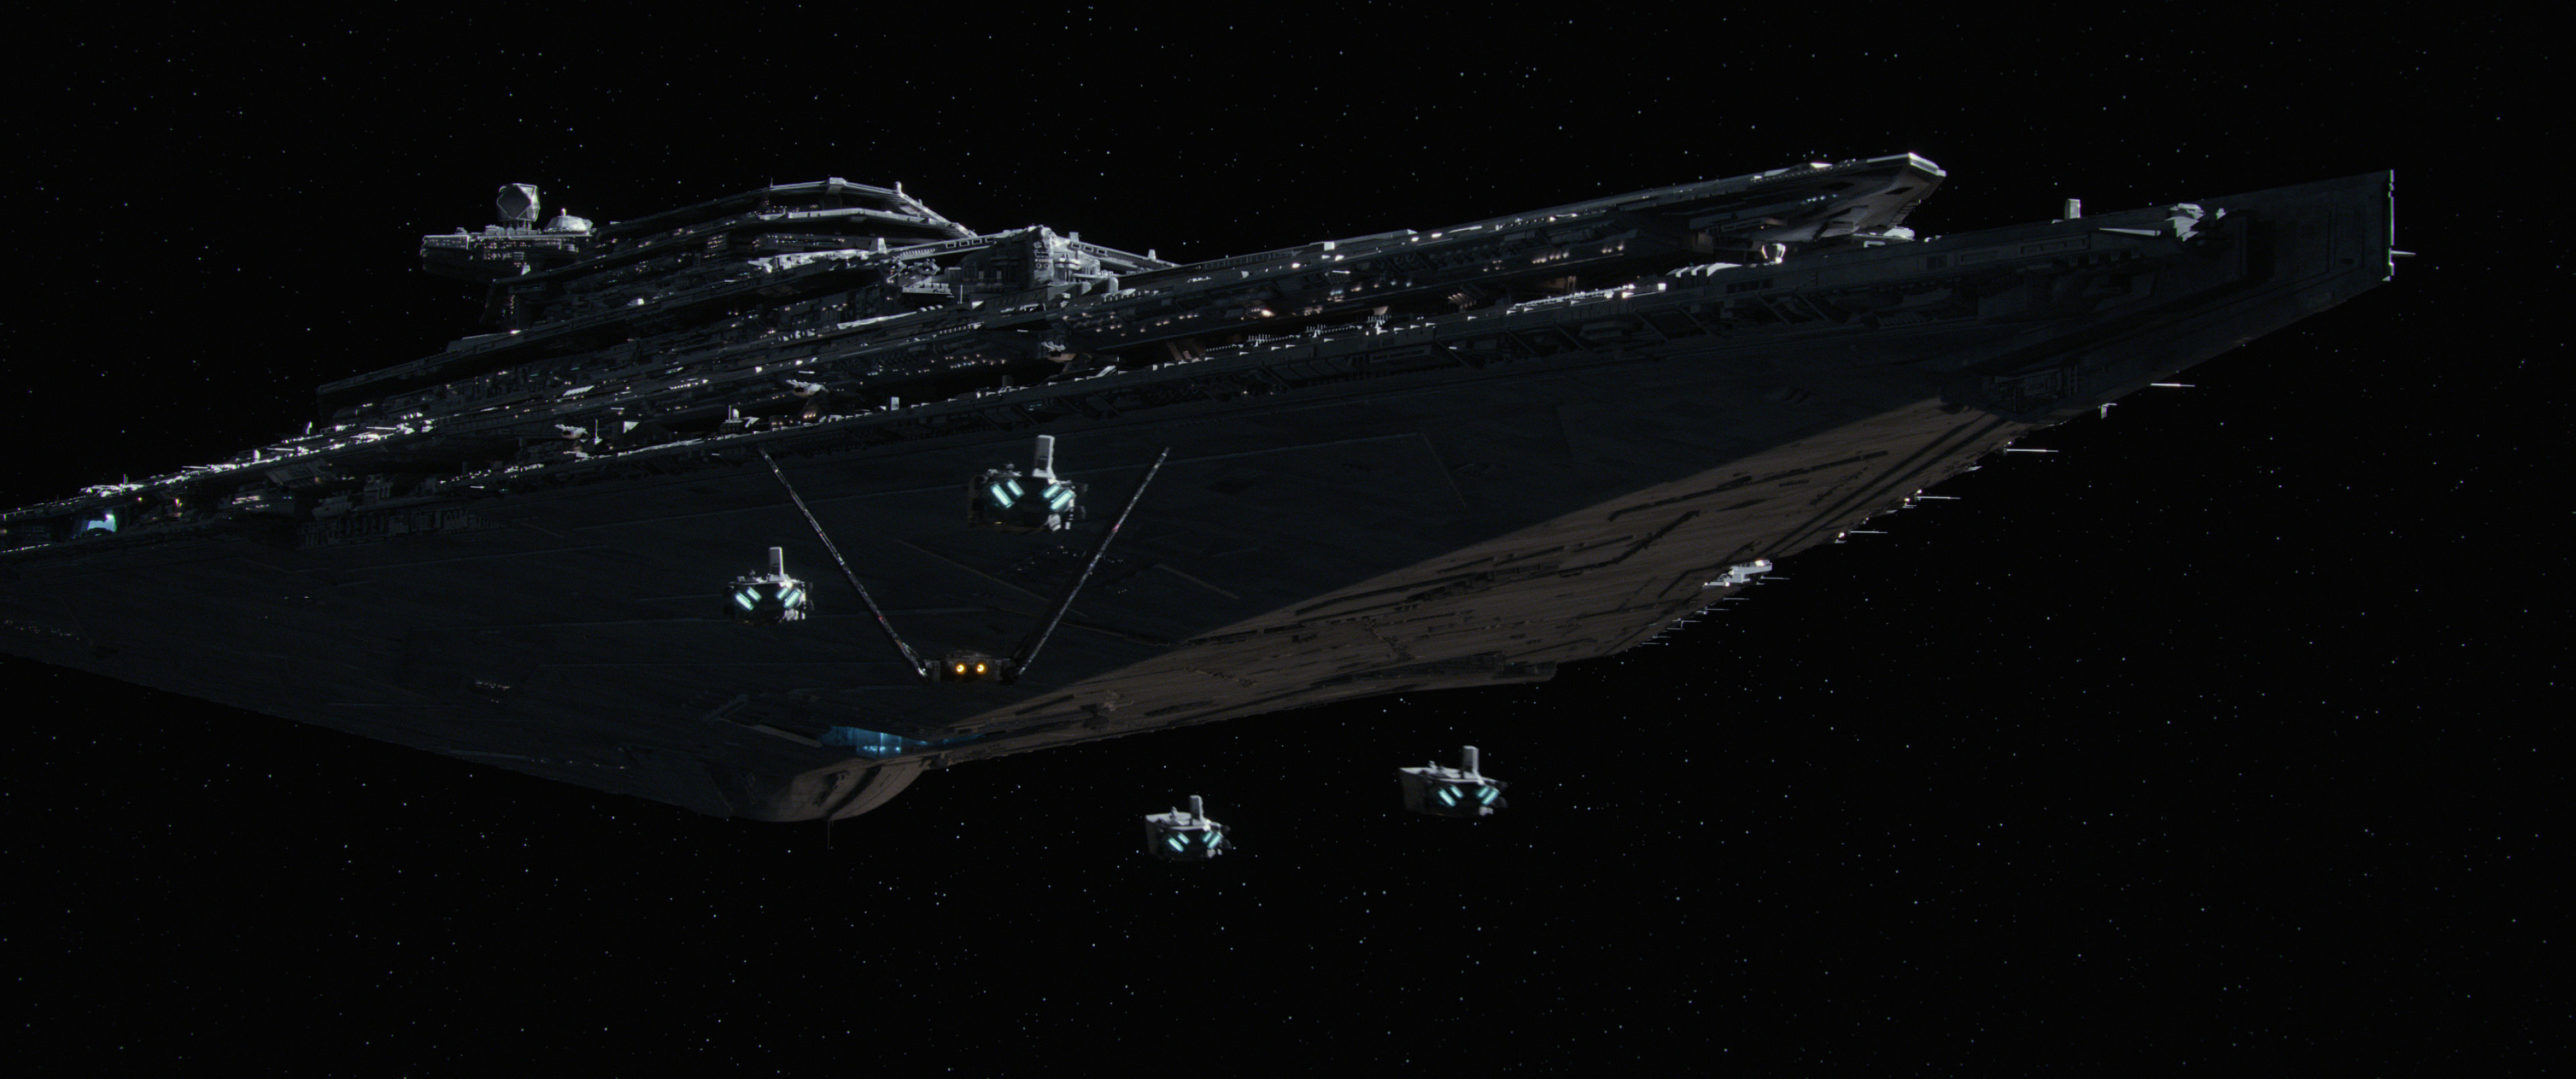 Star Wars First Order Wallpaper (69+ images)